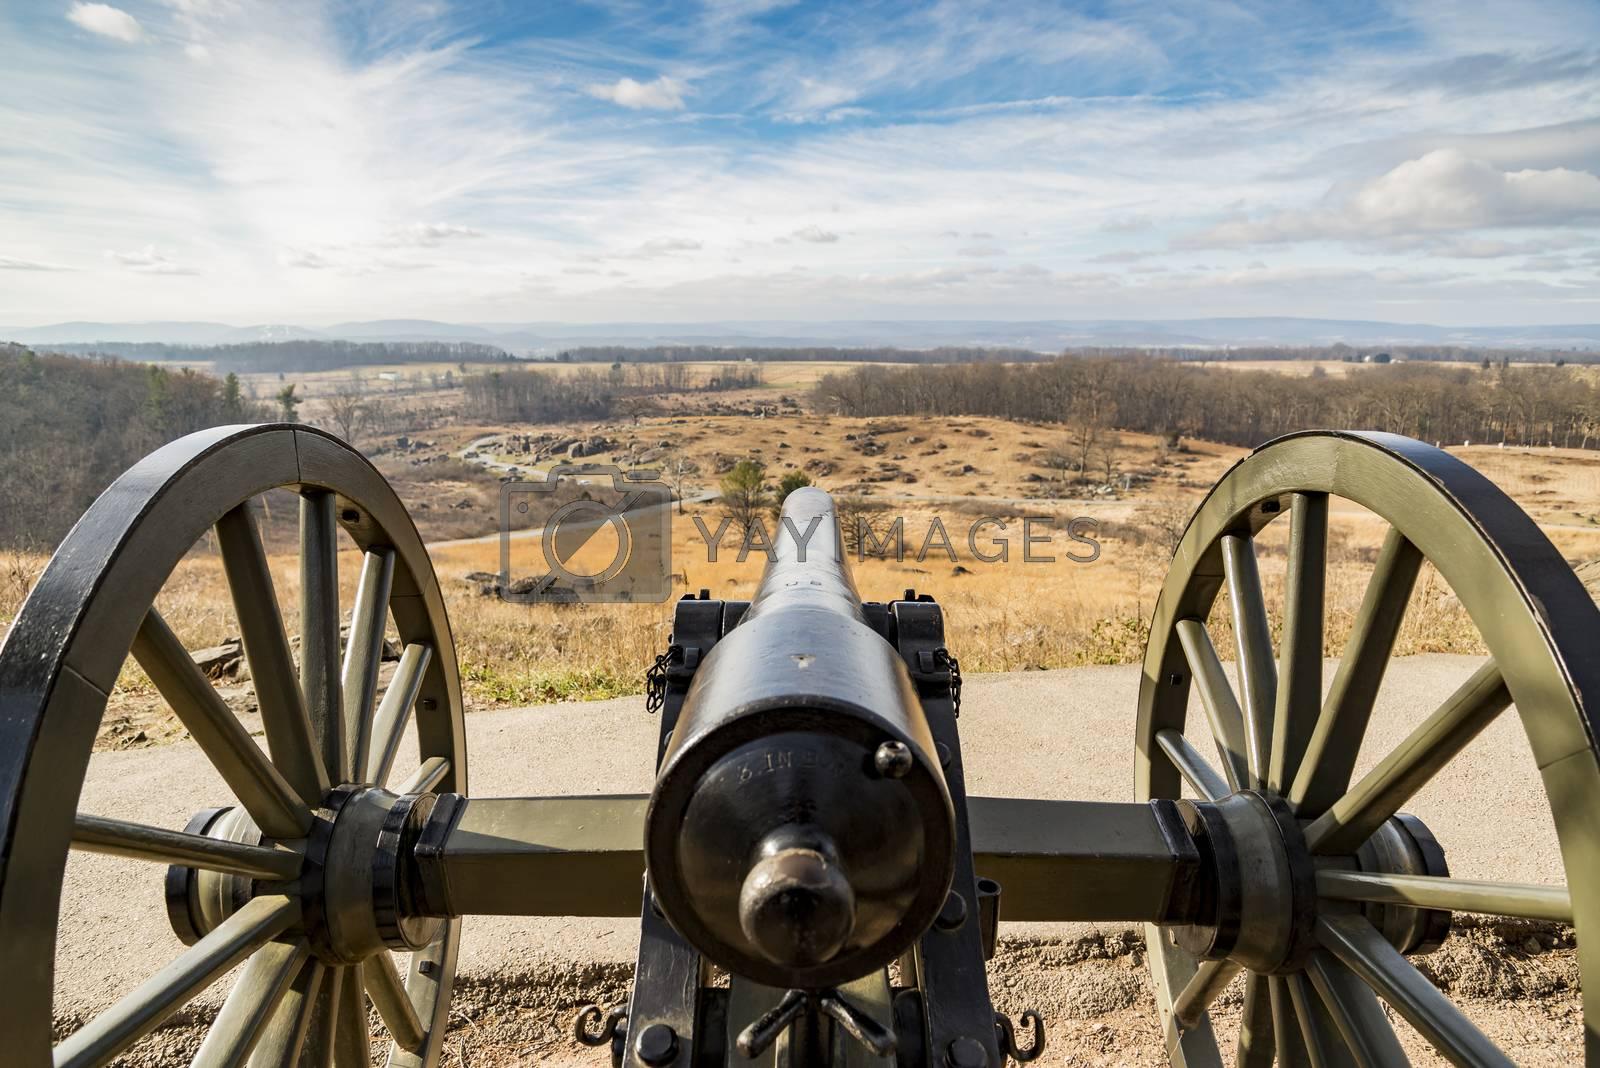 Civil war canon behind a stone wall on the Gettysburg battlefield in Autumn near sunset